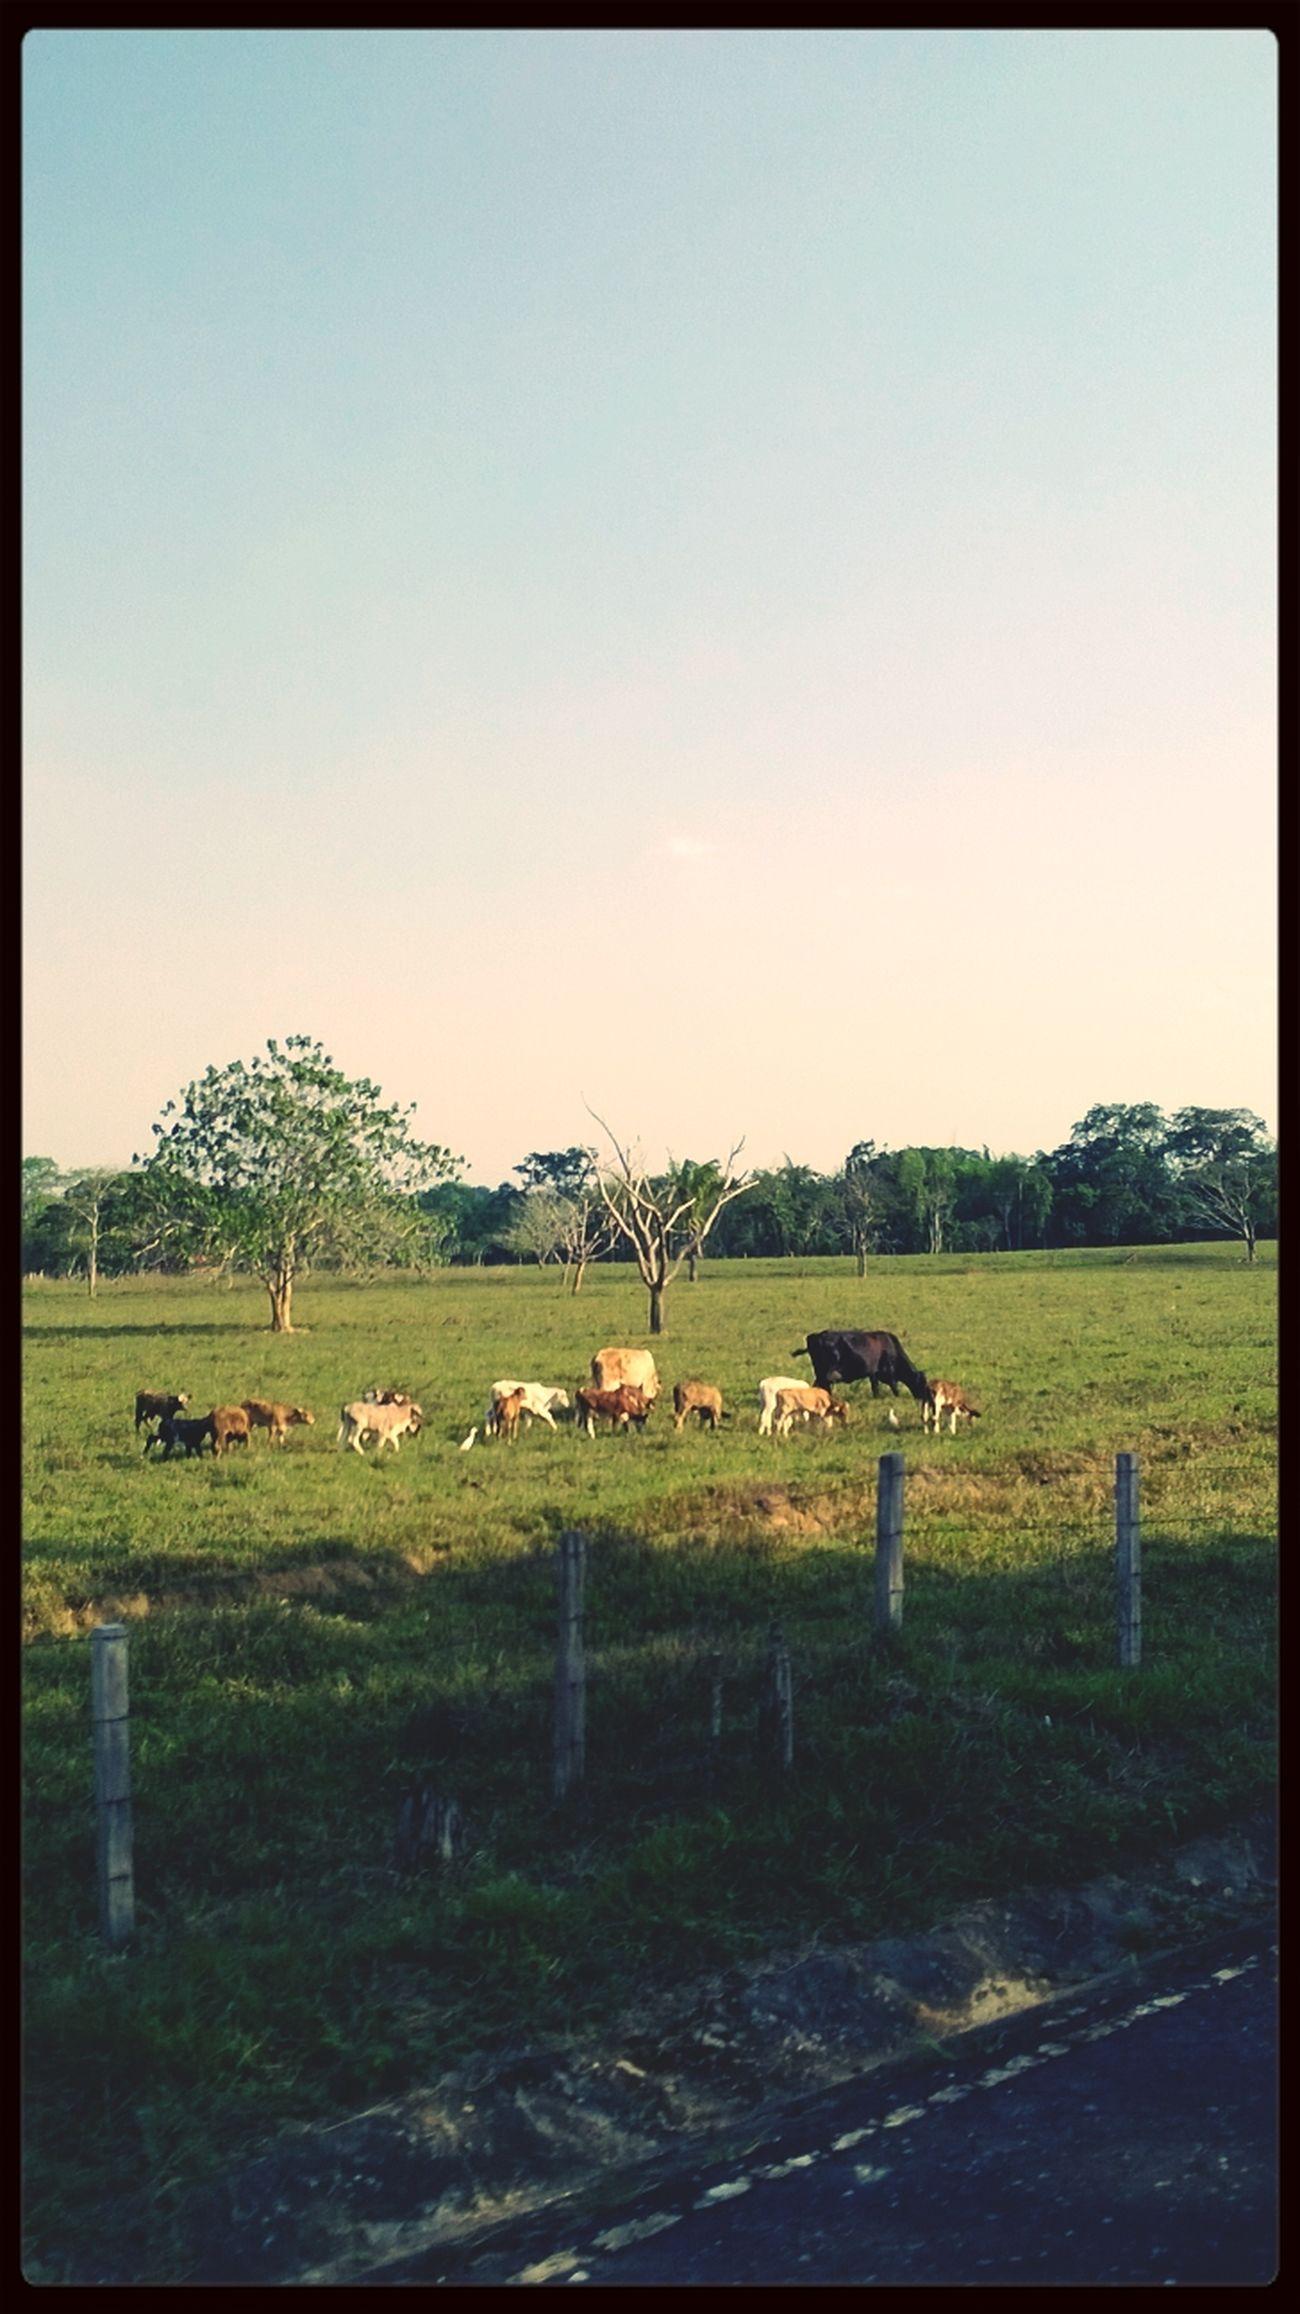 Animales Paisajes Hi! Like (: ??✌? La hermosura de la naturaleza! #Colombia☺?